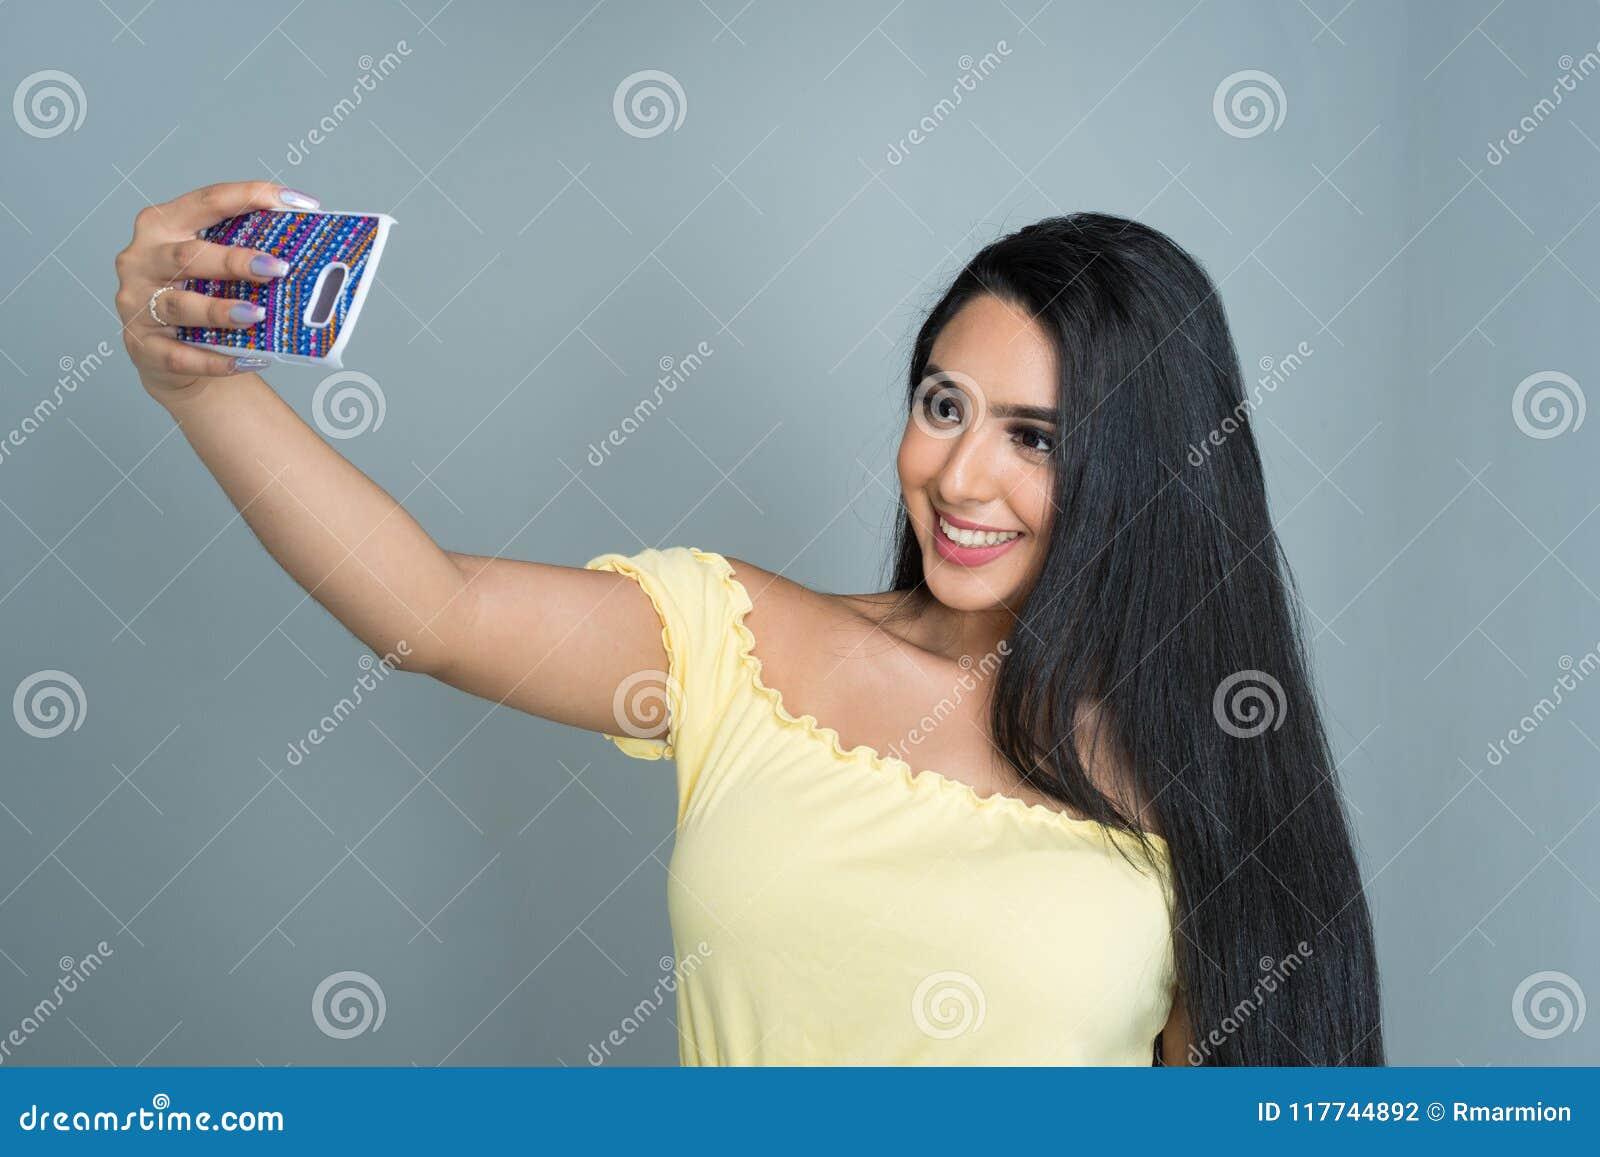 girl model teen Latin